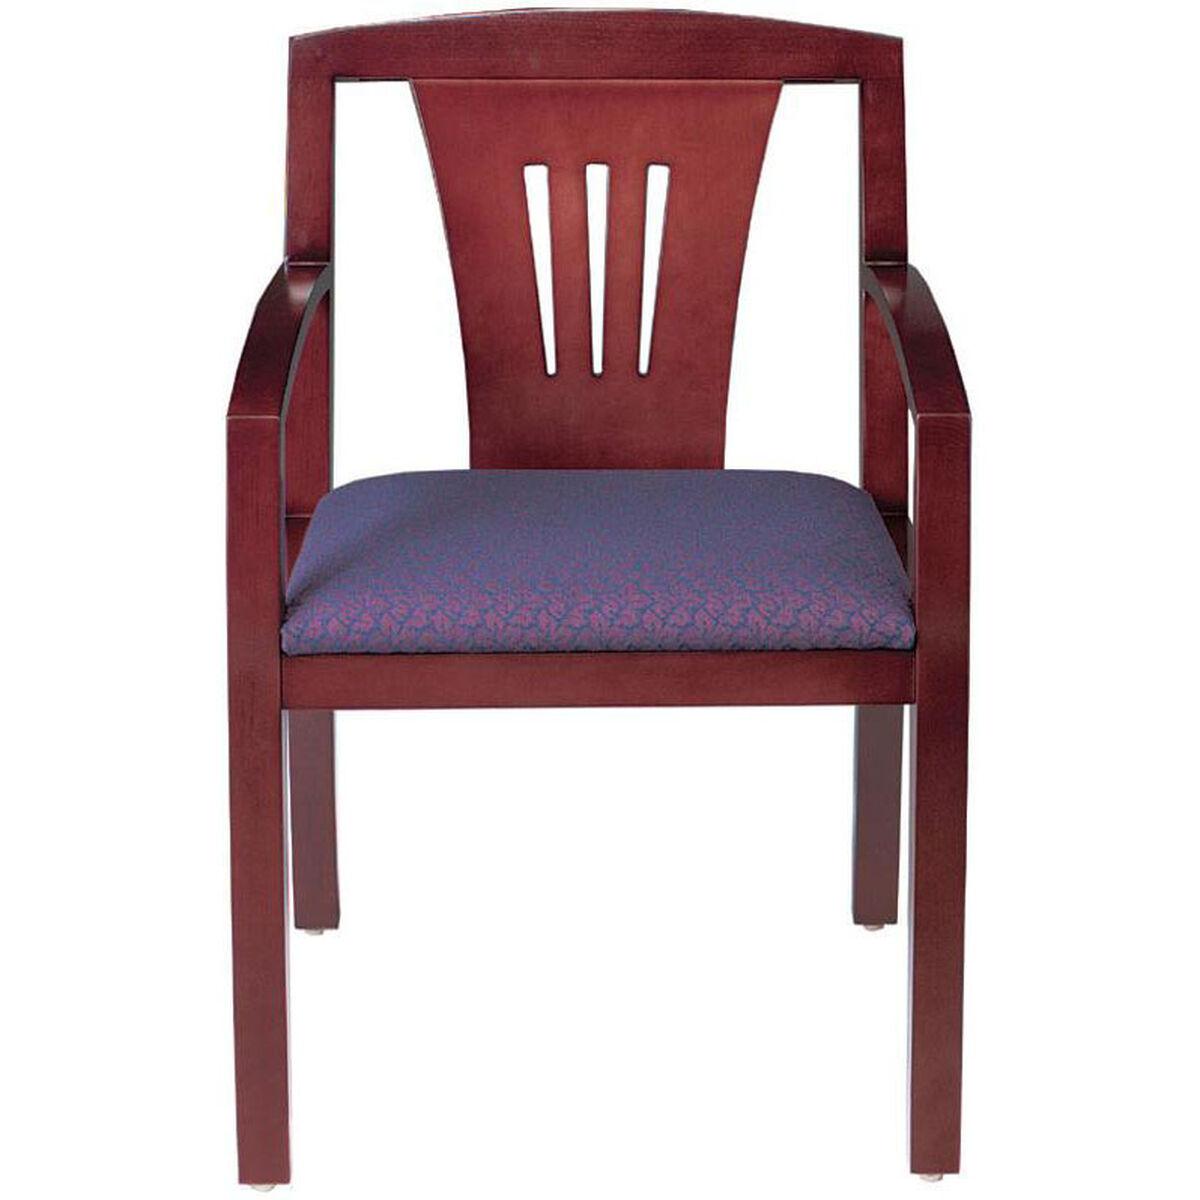 High Point Furniture Industries 9413 Hpf